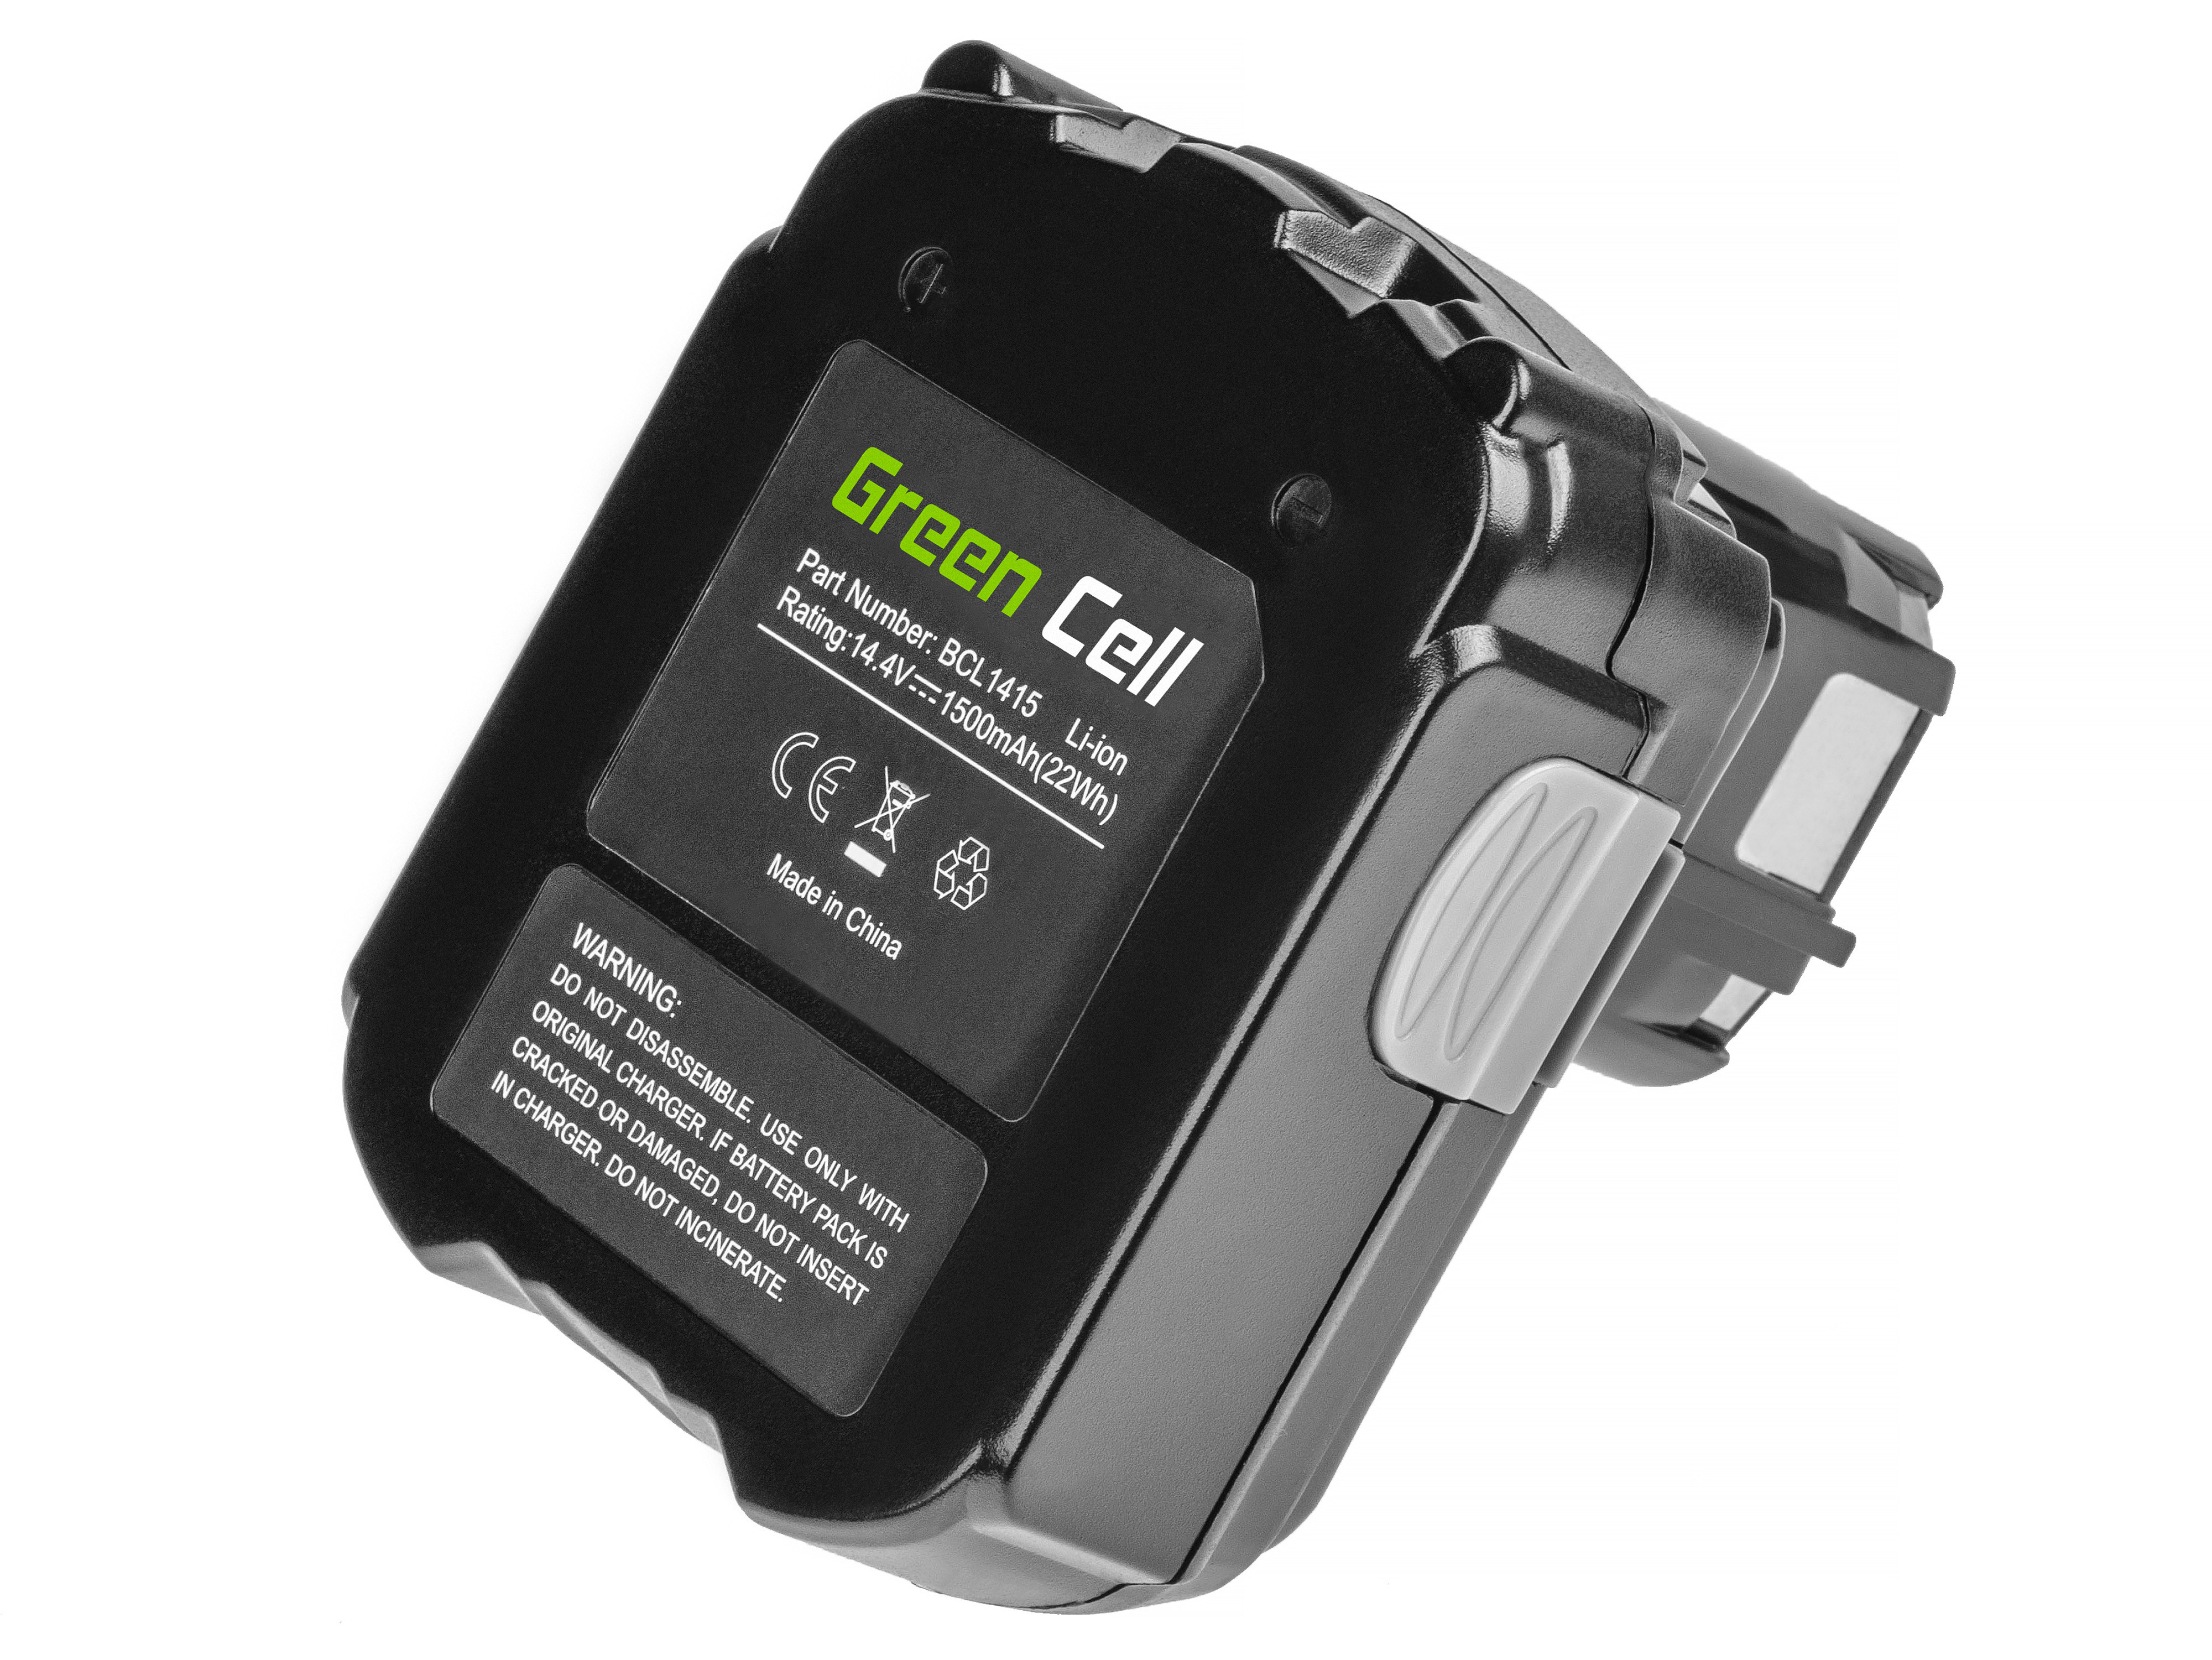 Baterie Green Cell Hitachi CJ14DL BCL1415 14.4V 1500mAh Li-ion - neoriginální